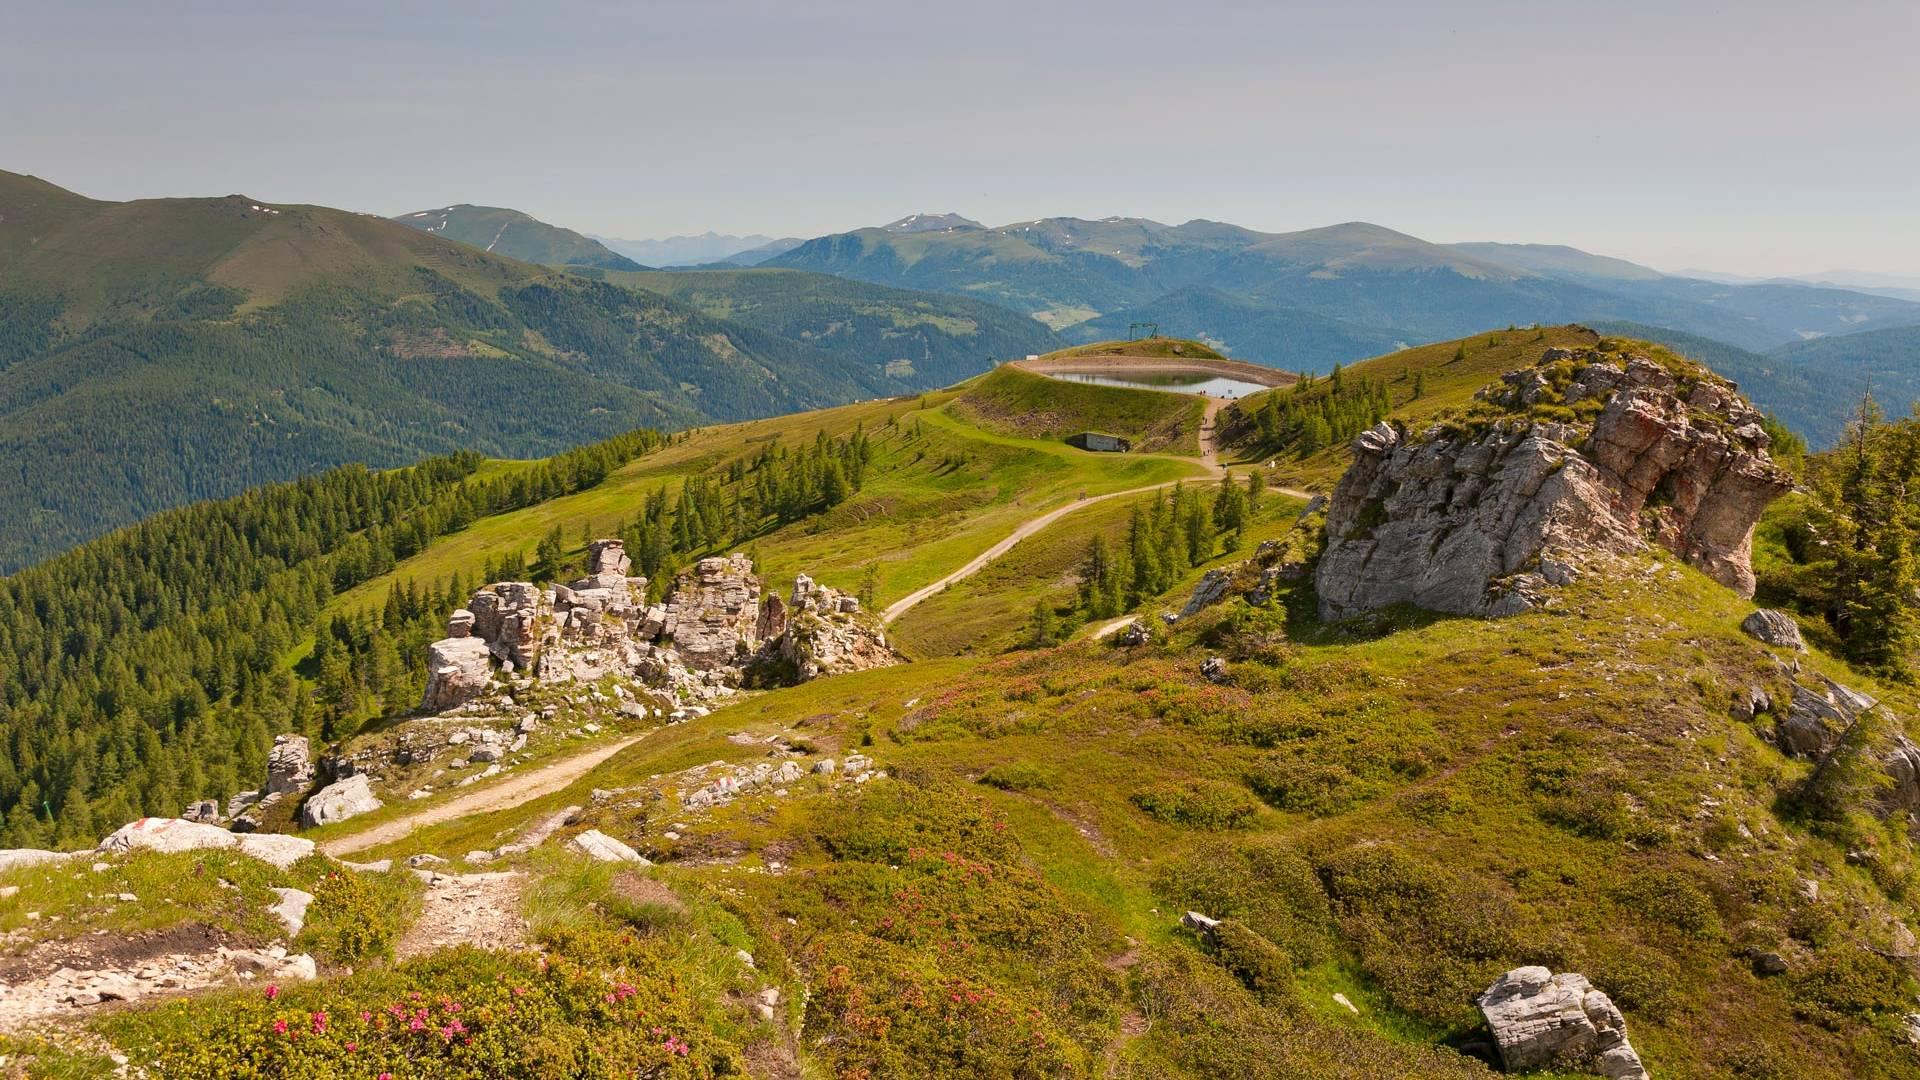 Alpe adria trail nockberge original